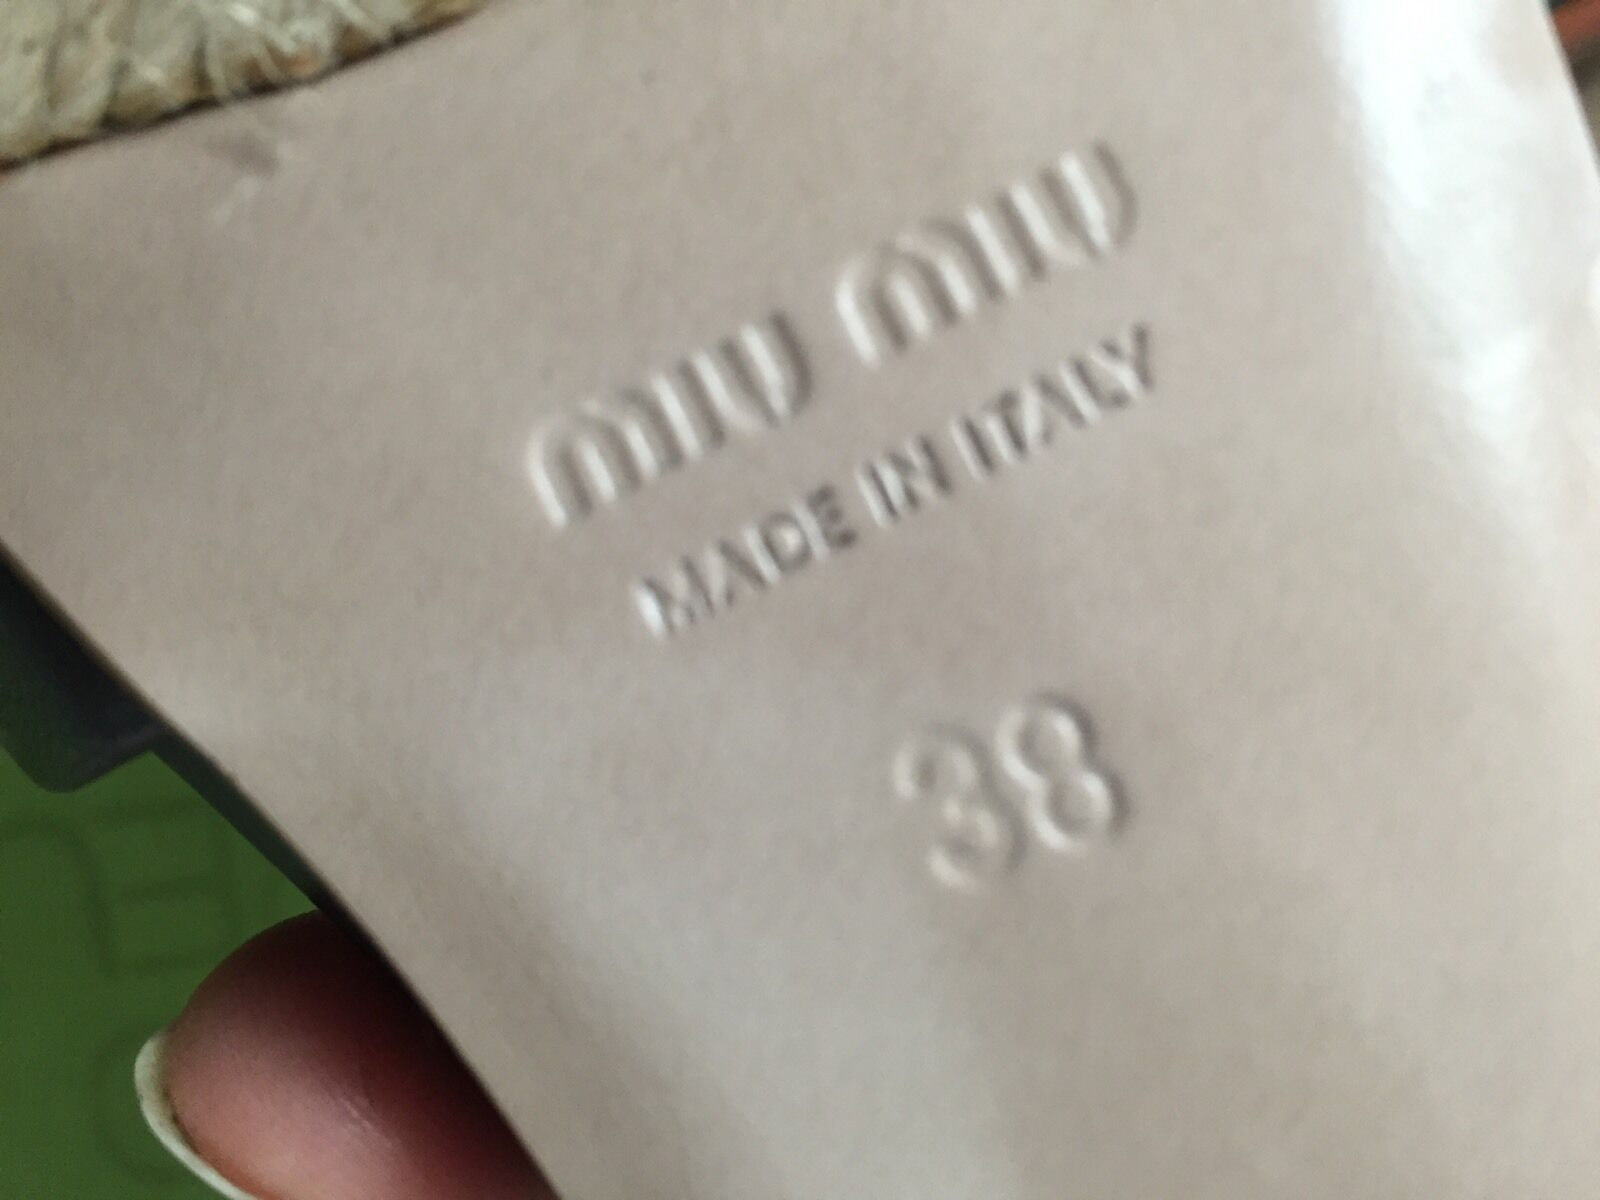 MIU MIU BY PRADA PLATEAU HEELS HEELS HEELS LEDER 38/39 WIE NEU 232c33